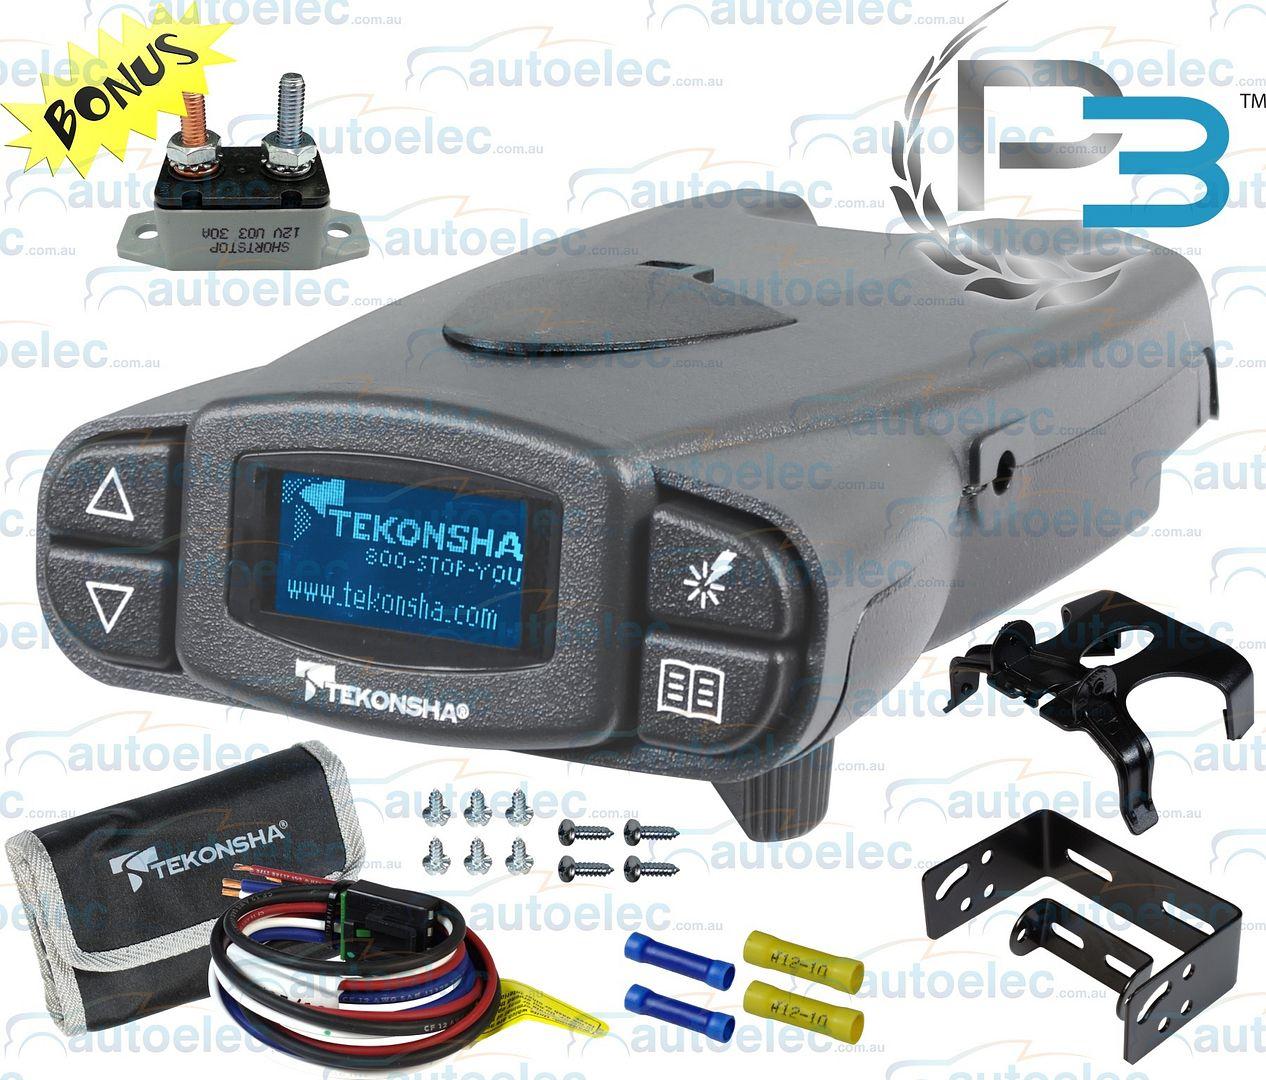 prodigy electric brake controller wiring diagram index listing oftekonsha prodigy brake controller wiring diagram